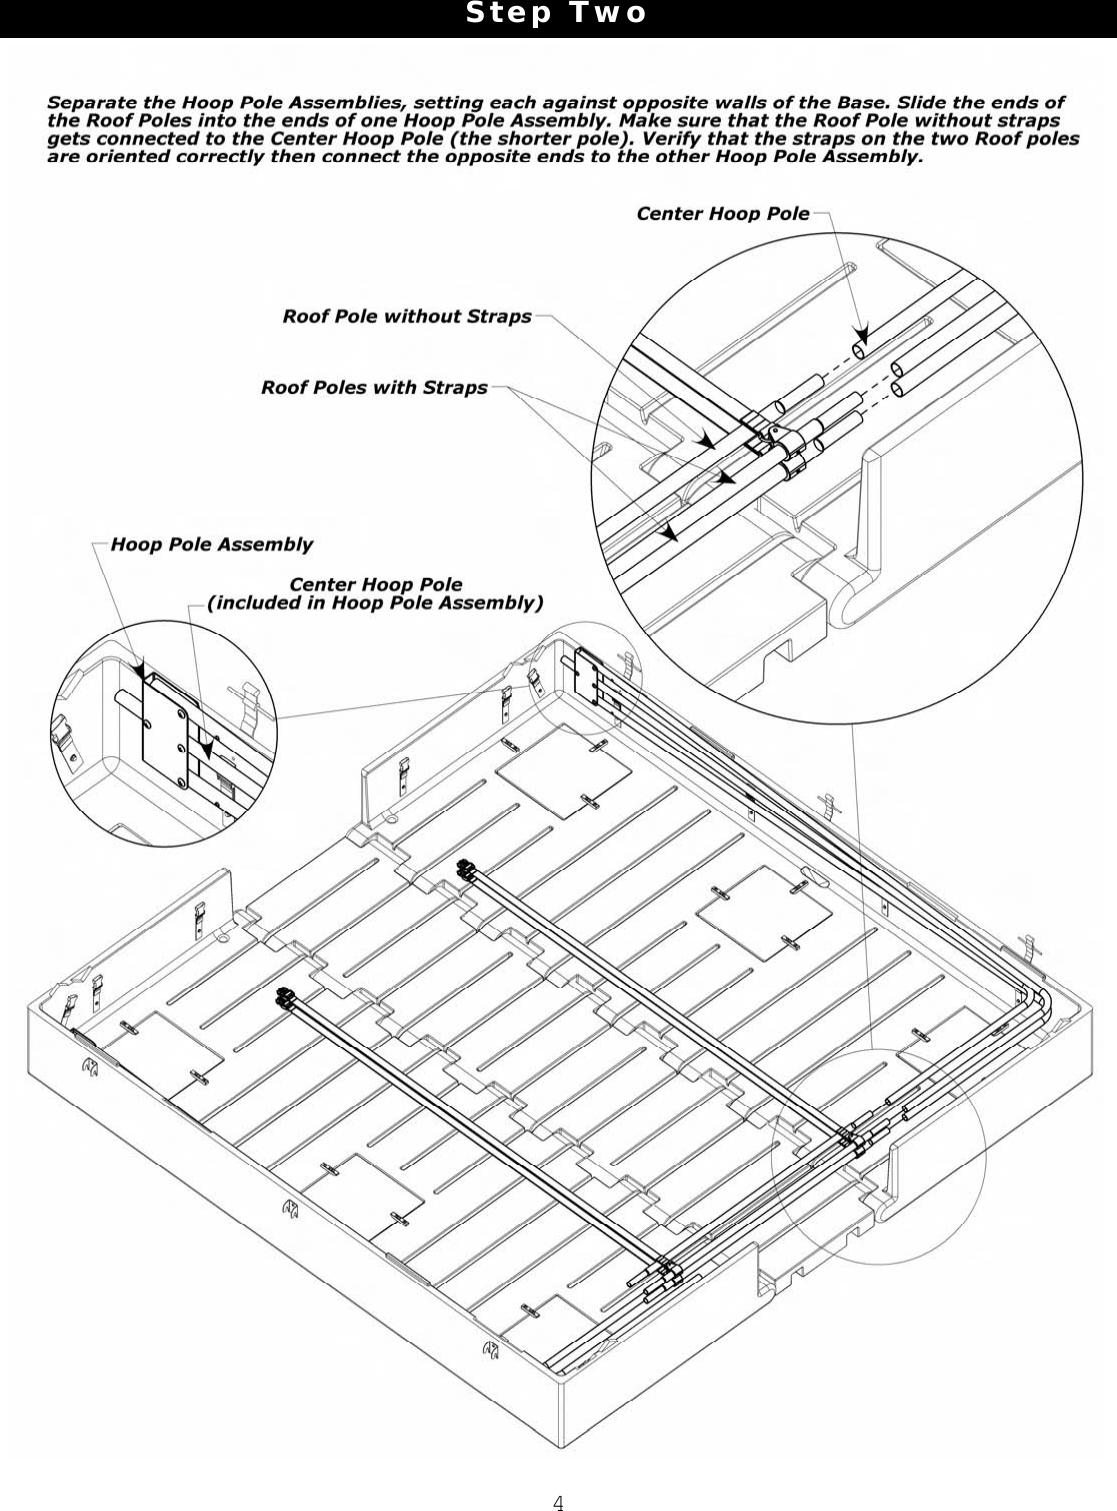 Clam Corp Sleeper 8 0 9 Users Manual ITEM 8200 2000